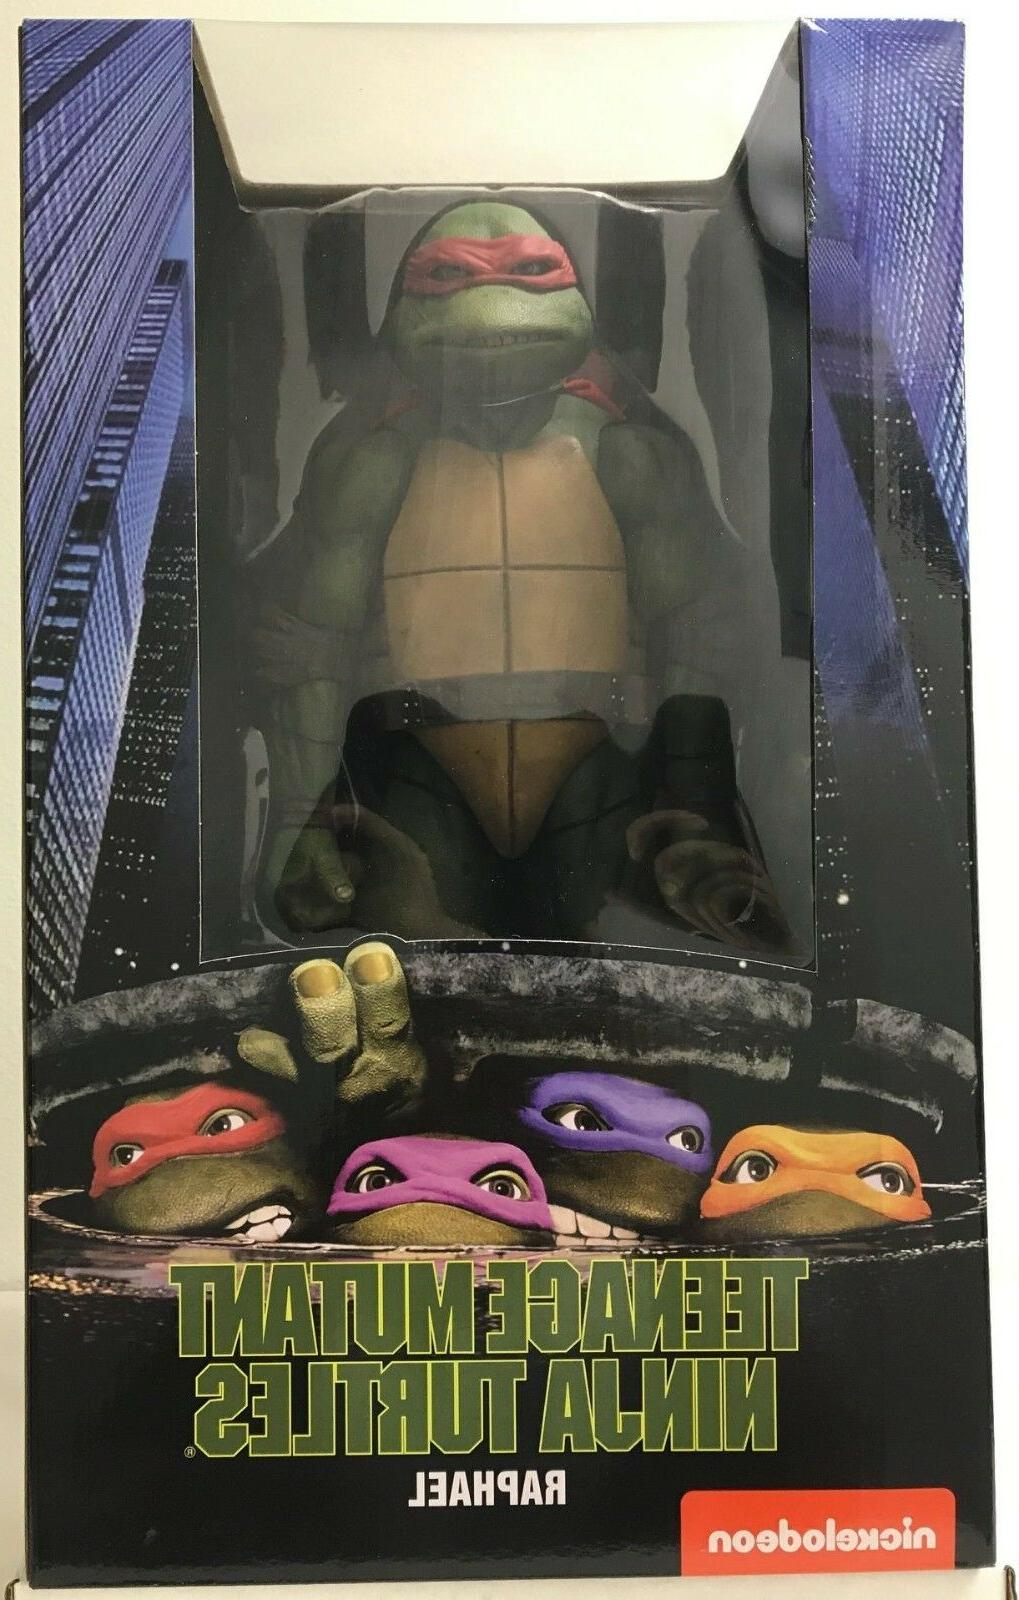 NECA Teenage Mutant Ninja Turtles 1990 Movie 1/4 Scale Actio